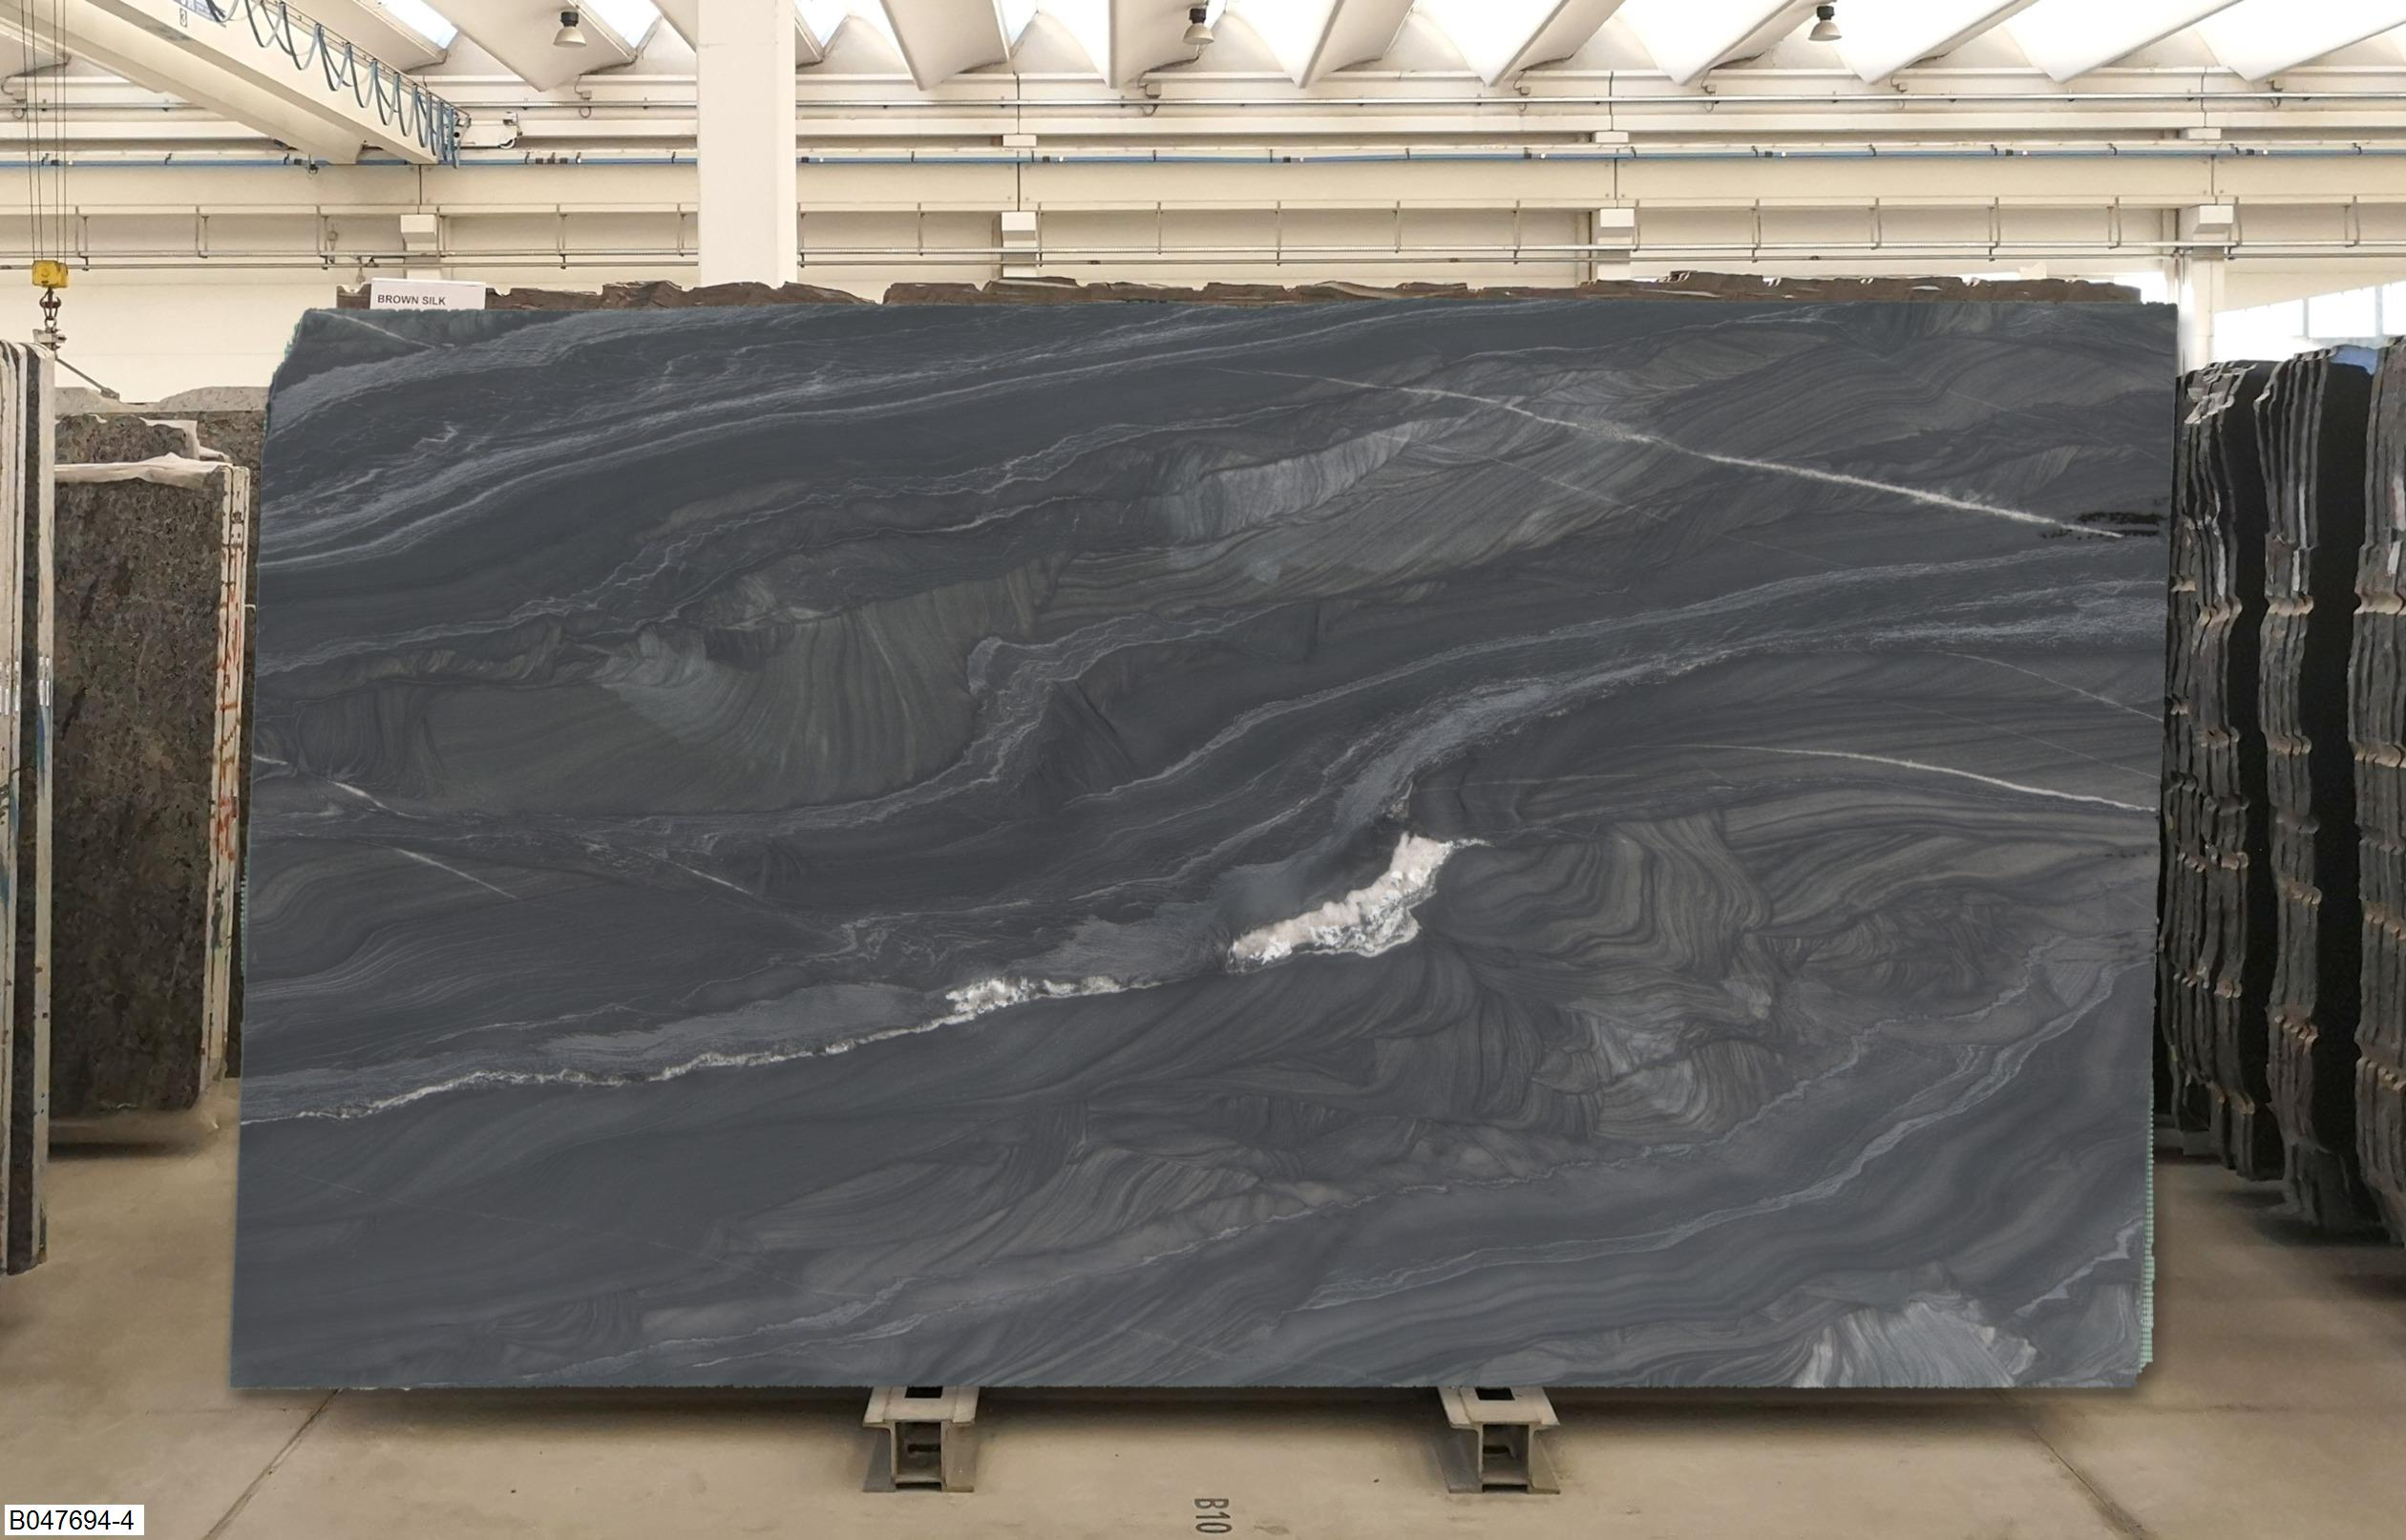 BLACK TEMPEST - LASTRE SATINATE-MACCHIA APERTA Foto: 1_59696_39239.jpg